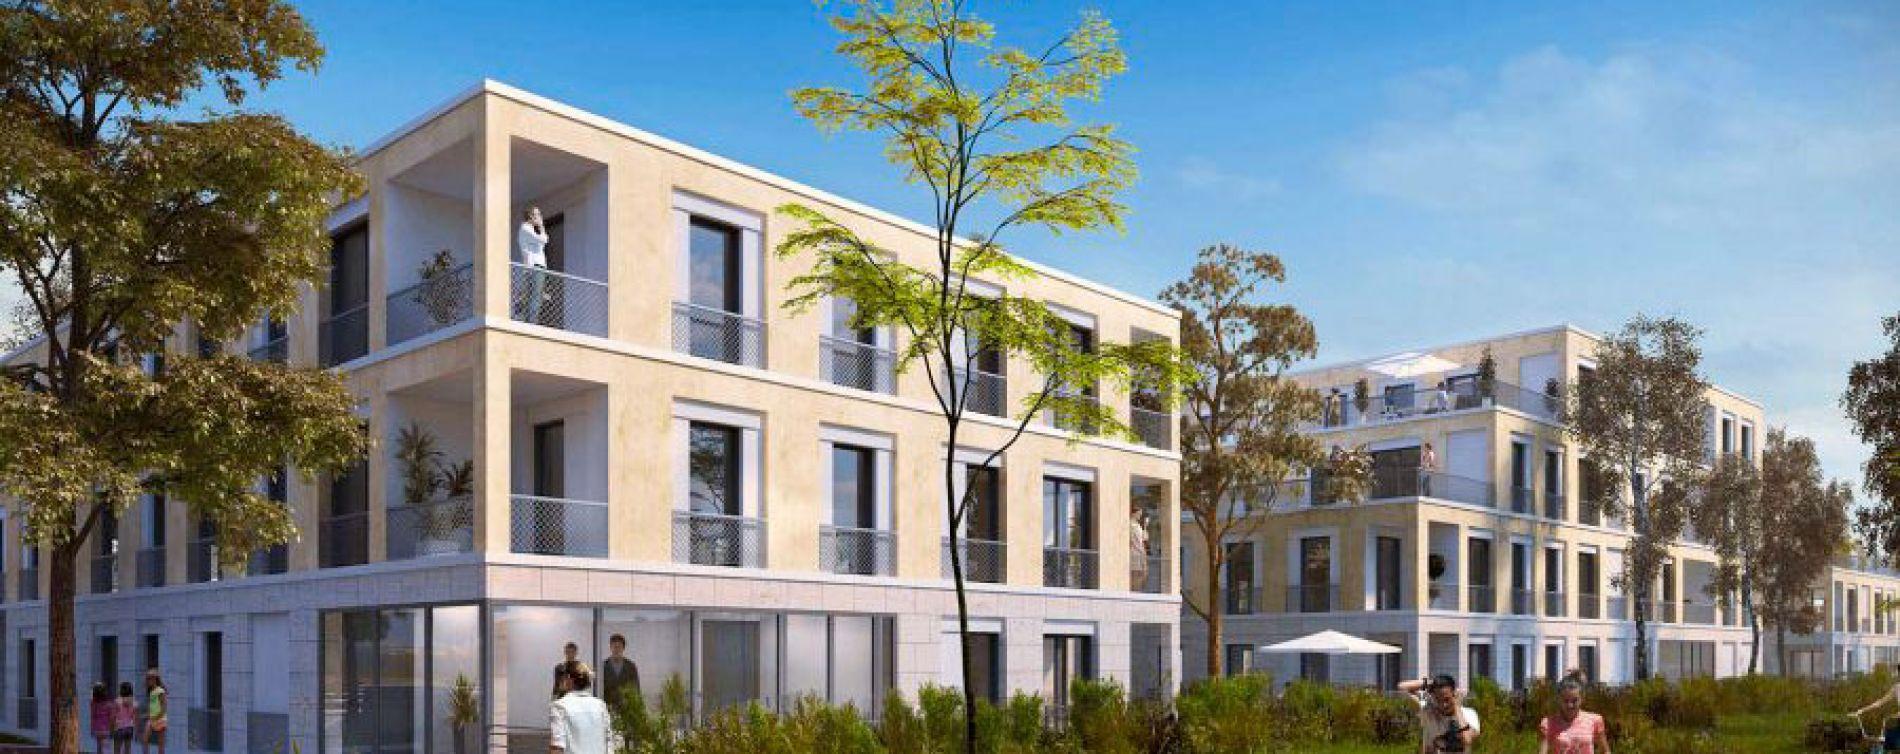 pavillon vert bondoufle programme immobilier neuf n 213461. Black Bedroom Furniture Sets. Home Design Ideas